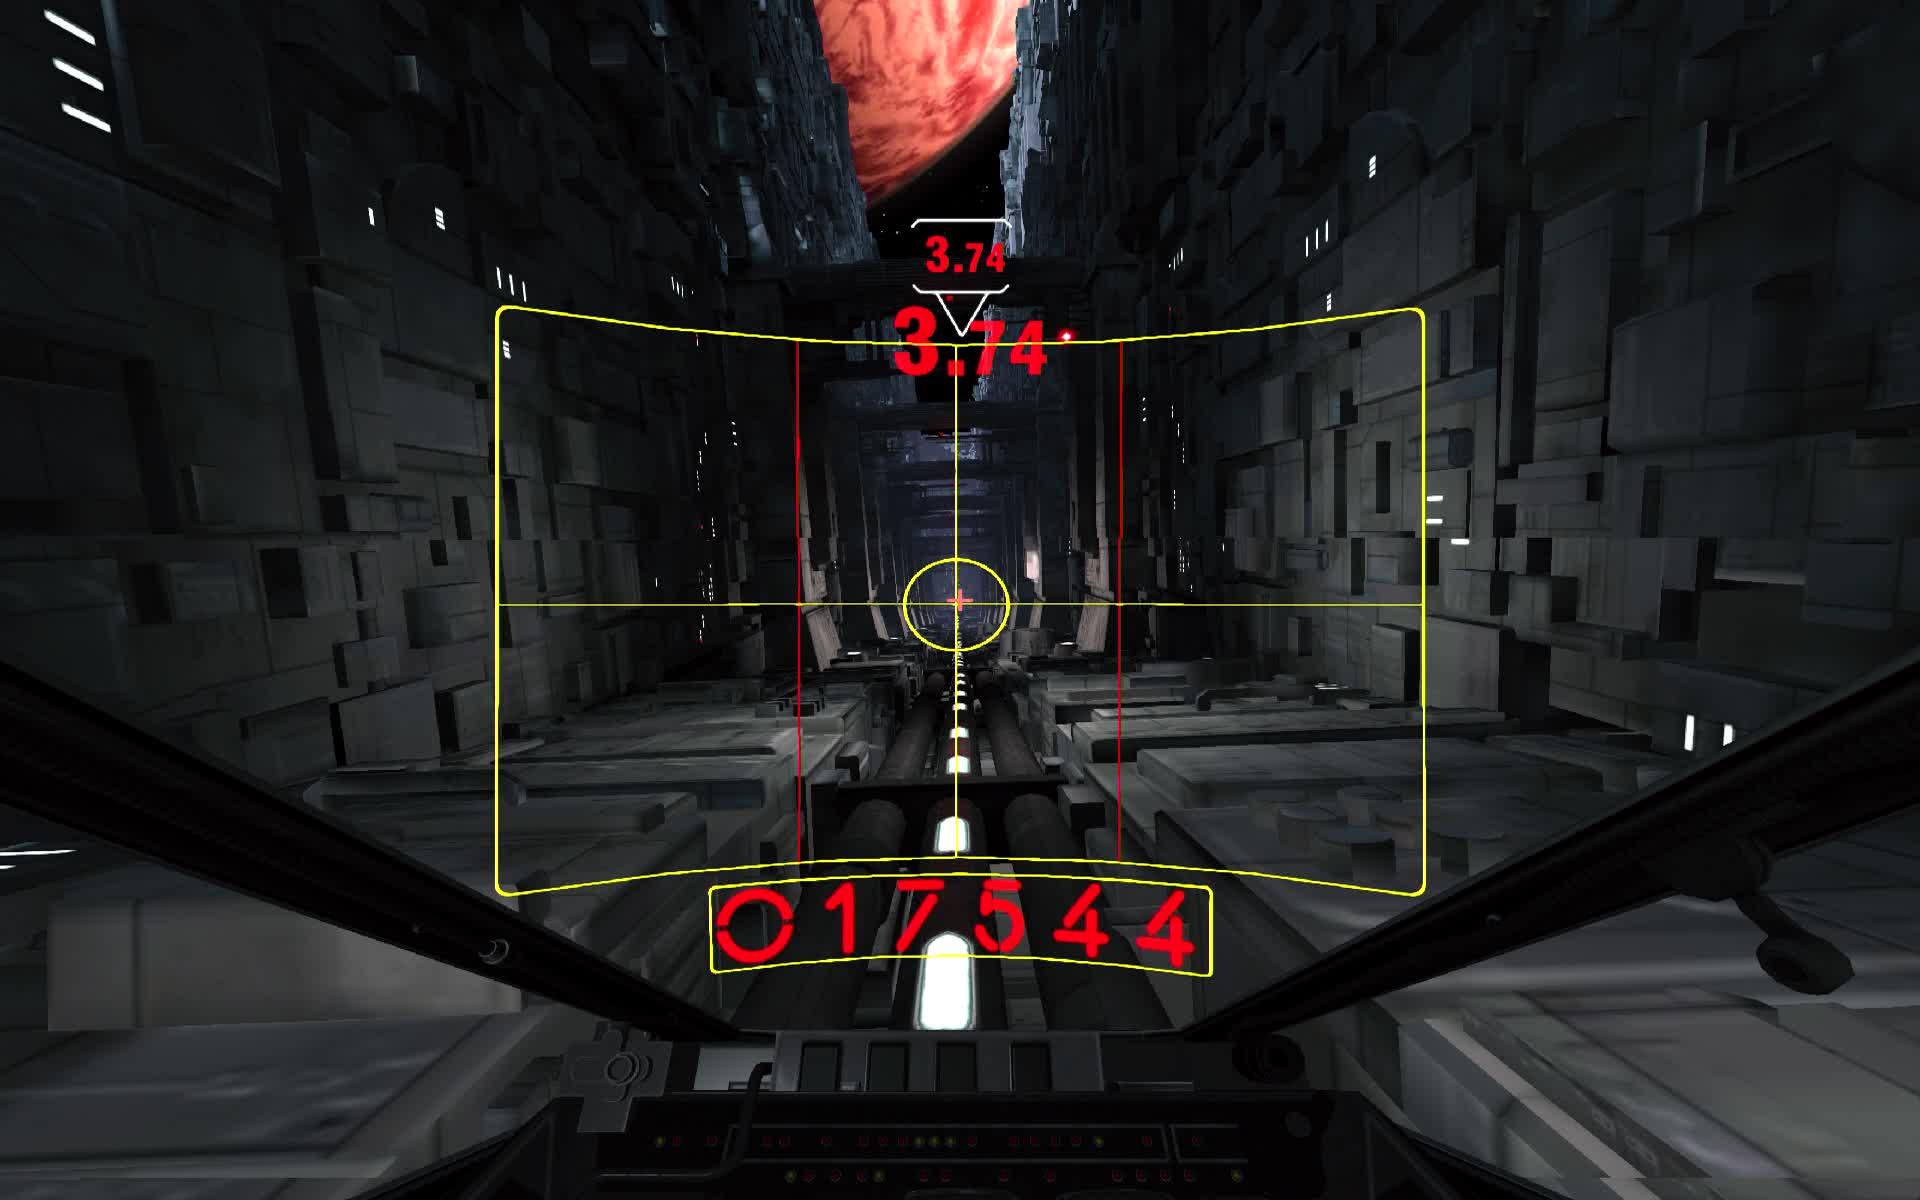 Star Wars  Battle Pod Arcade Machine  Liberty Games